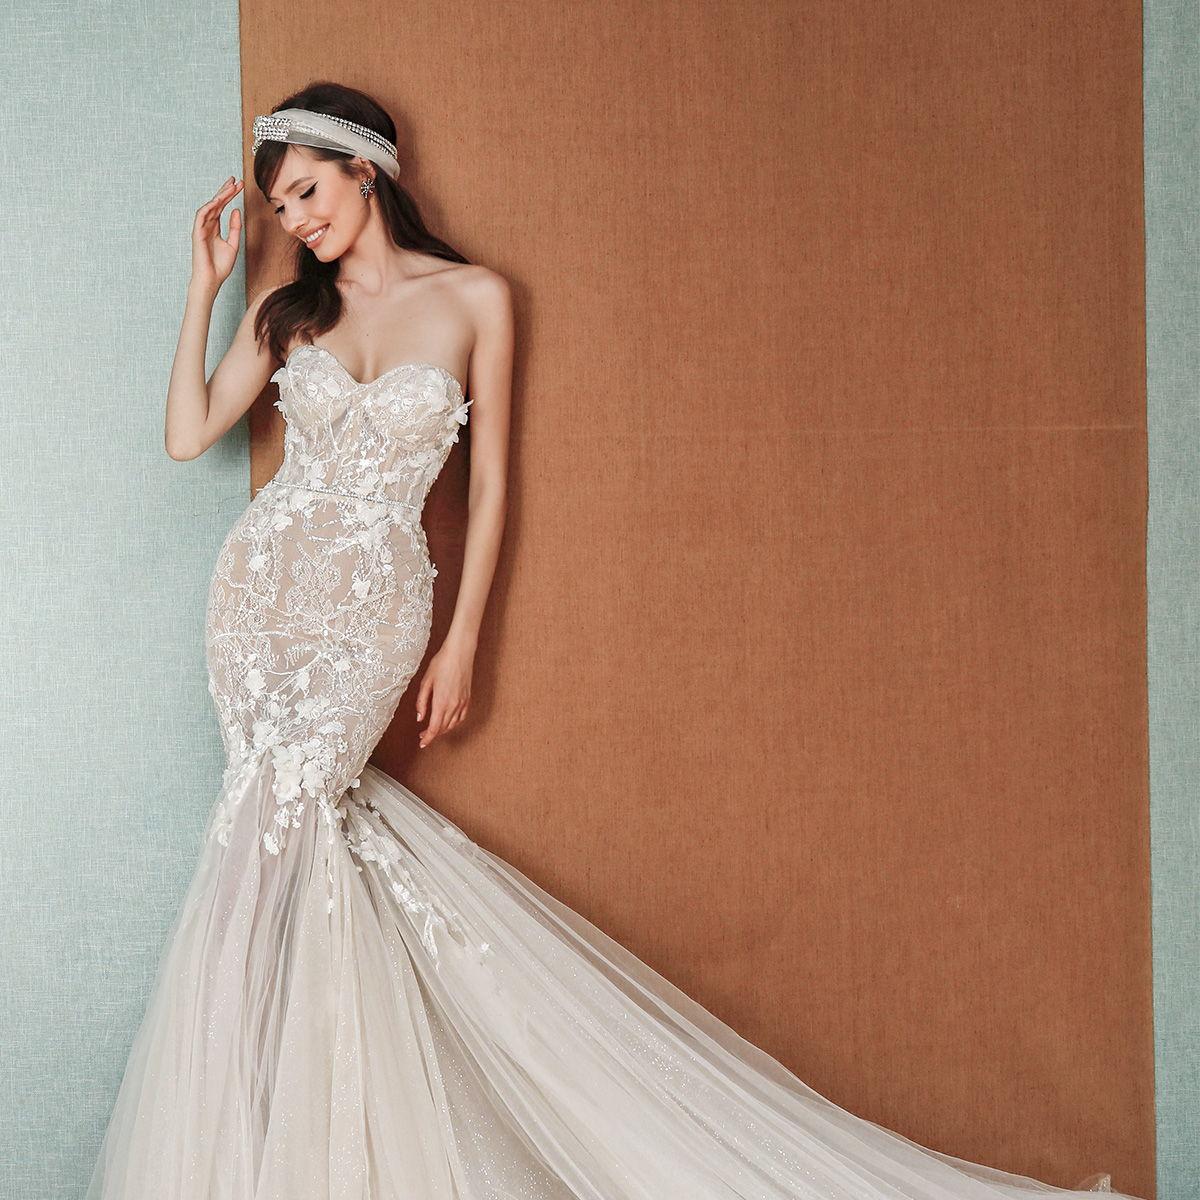 berta spring 2021 privee bridal weddinginspirasi featured wedding gowns dresses and collection